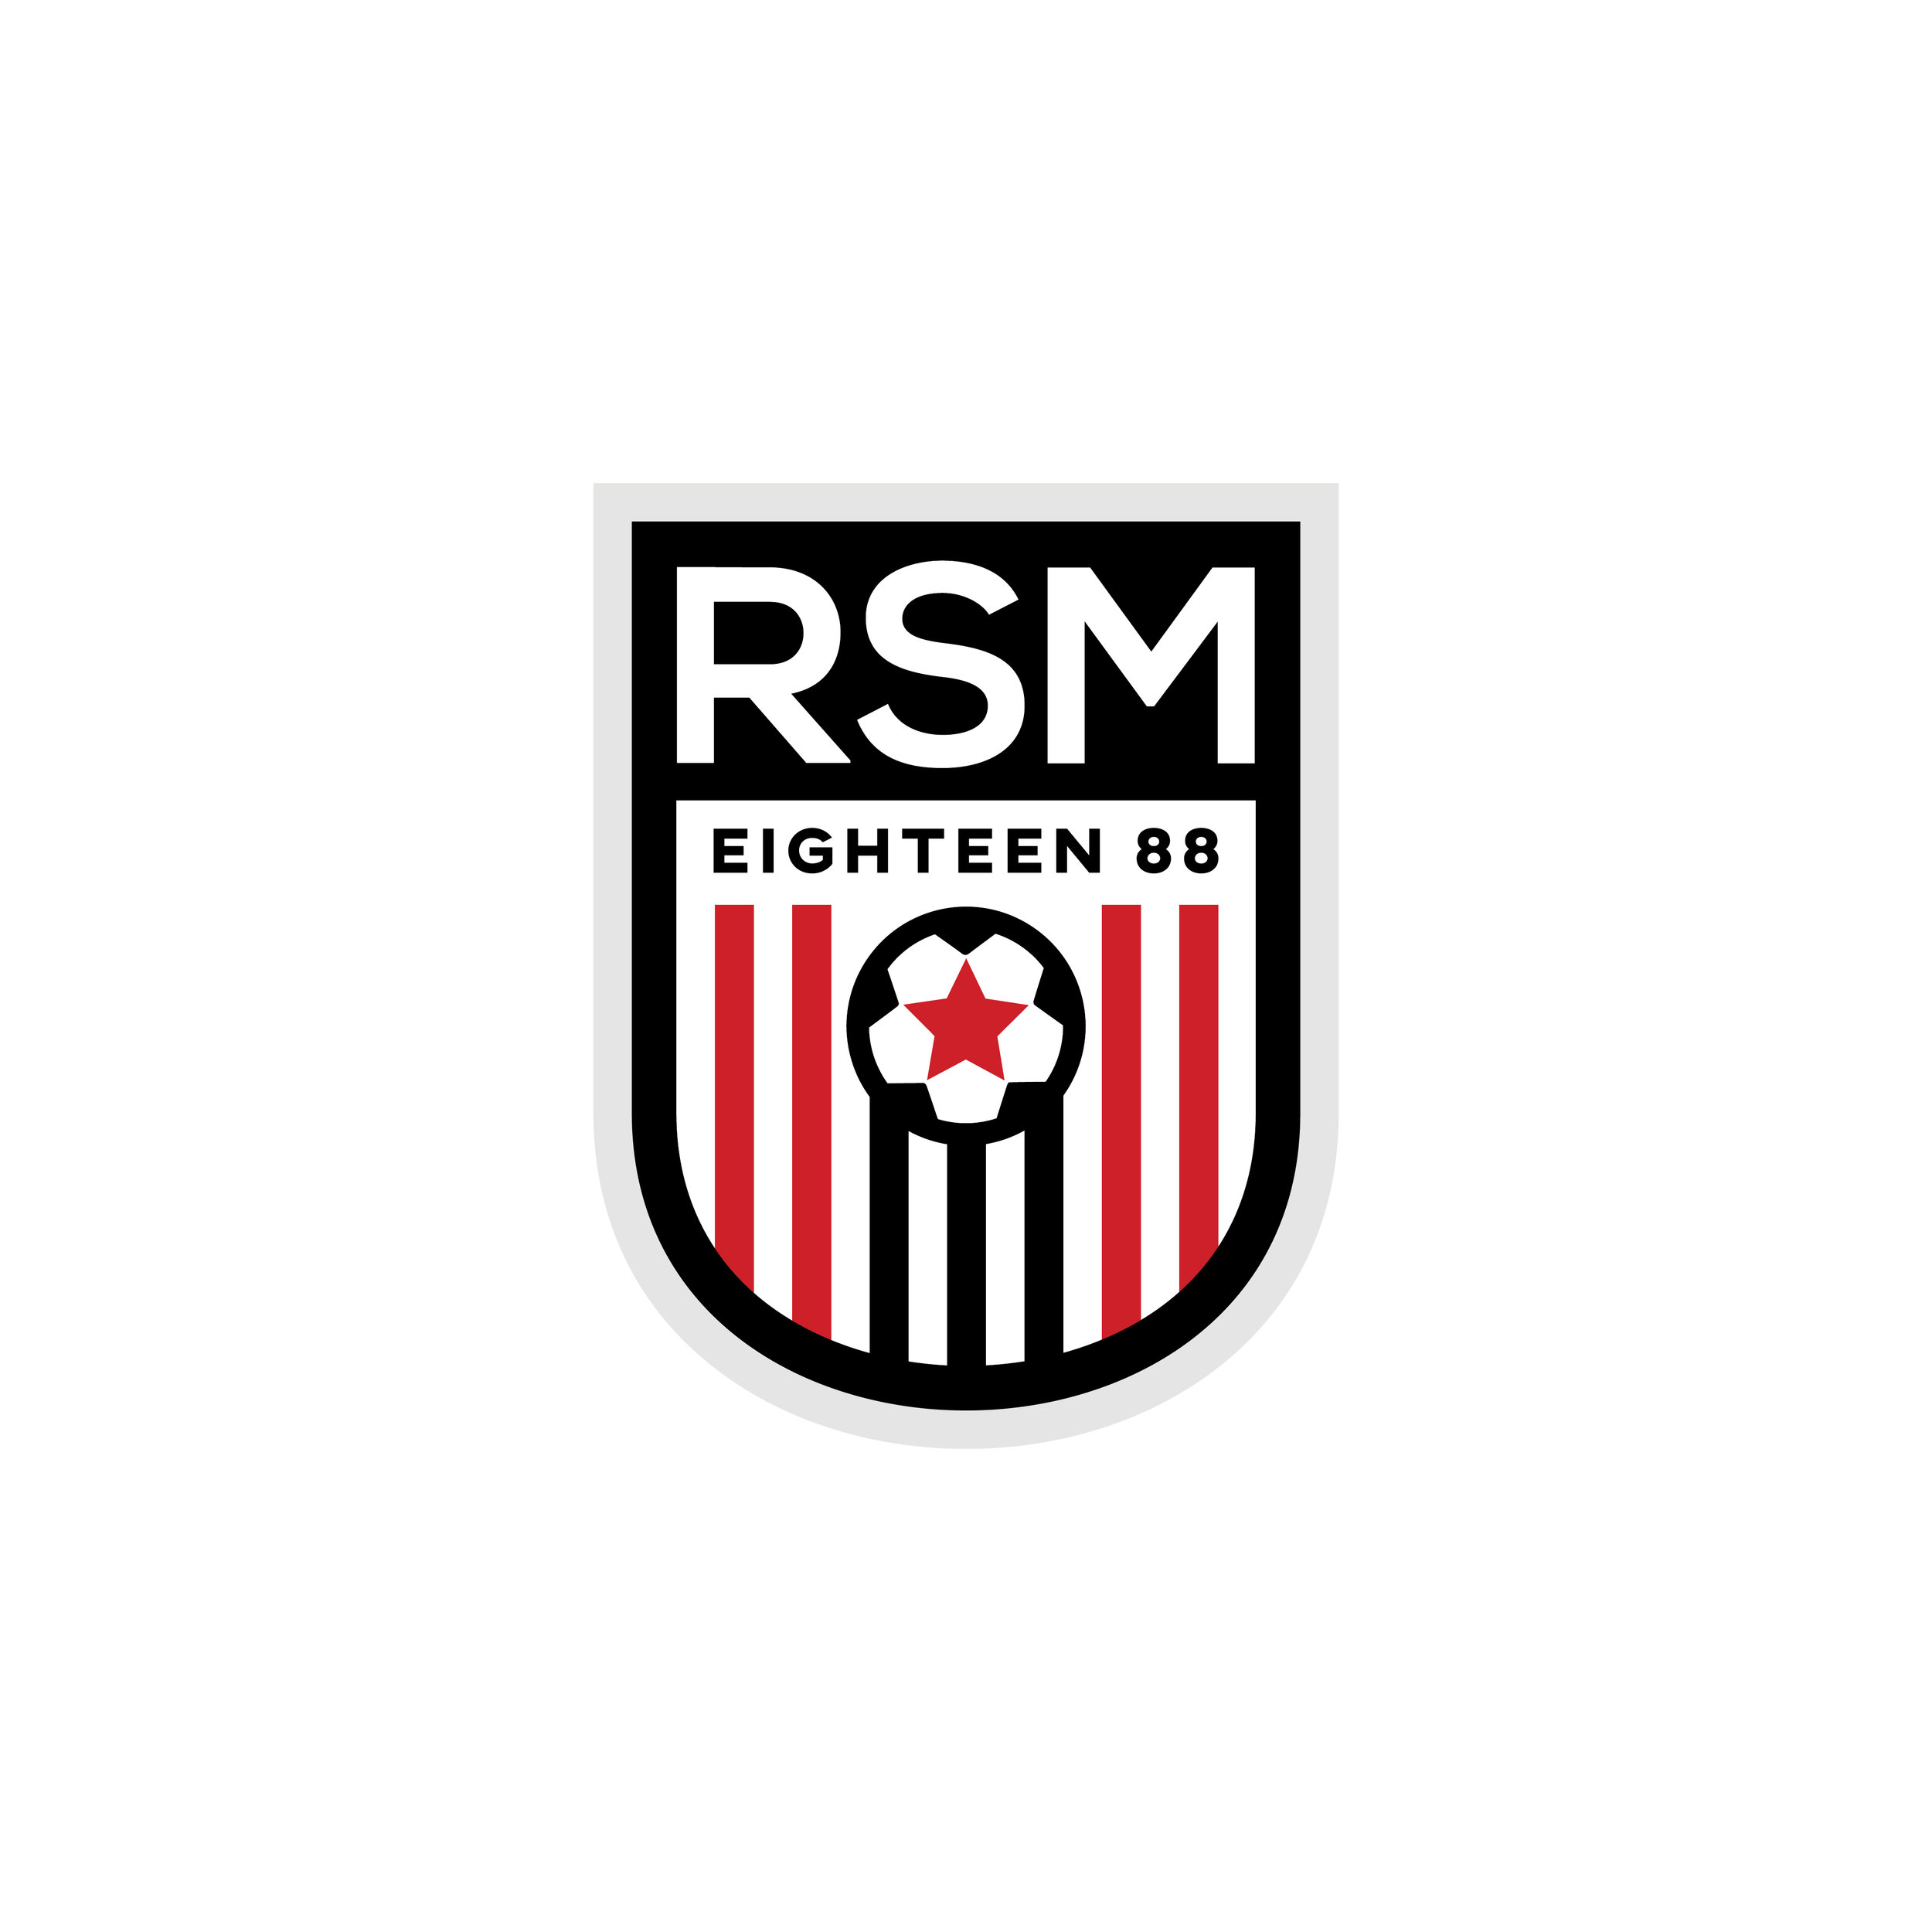 GMSA Crest Redesign-44.jpg